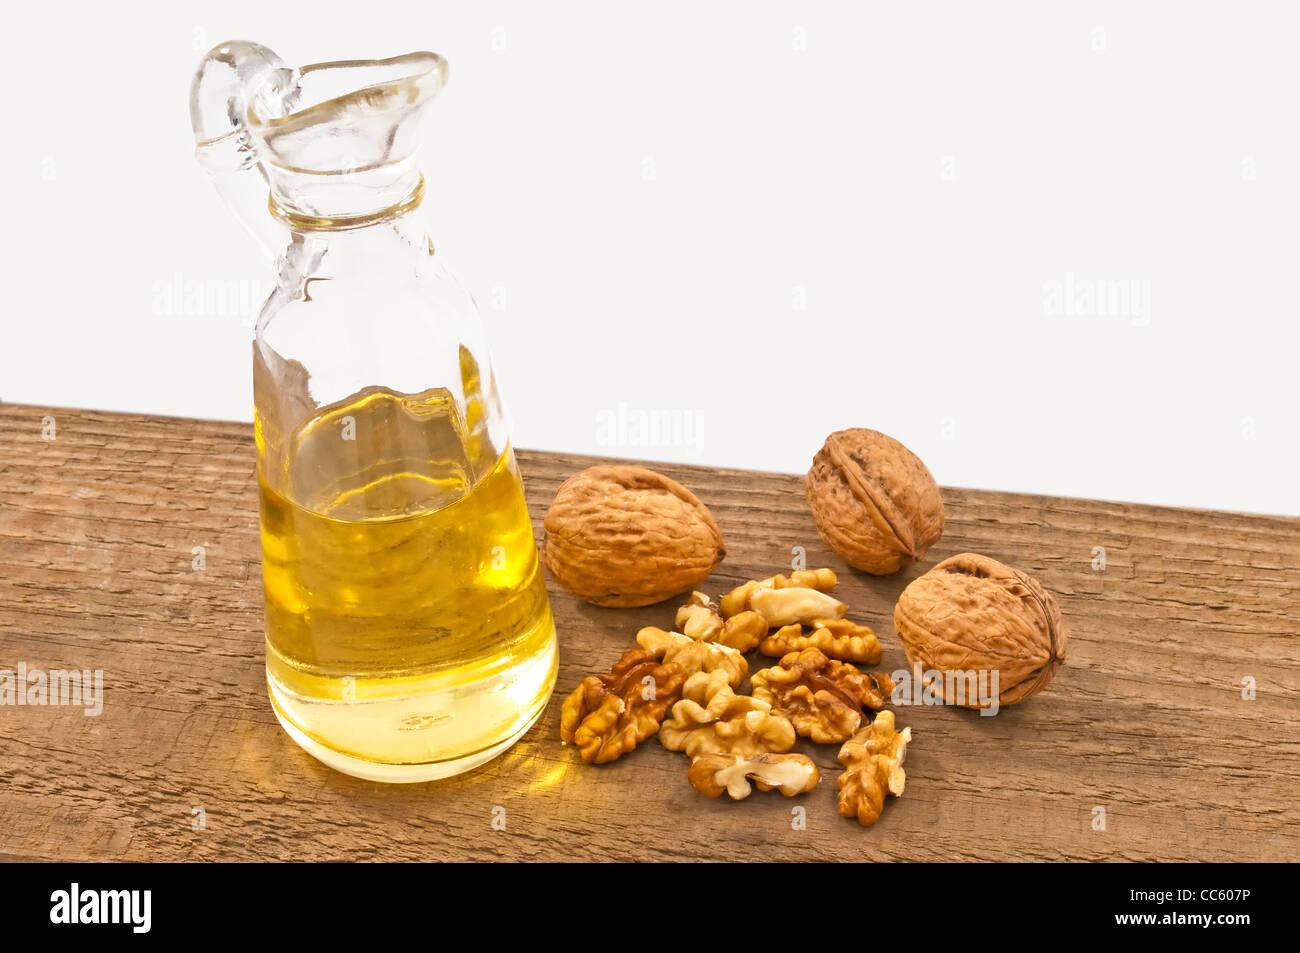 walnut oil with walnuts - Stock Image